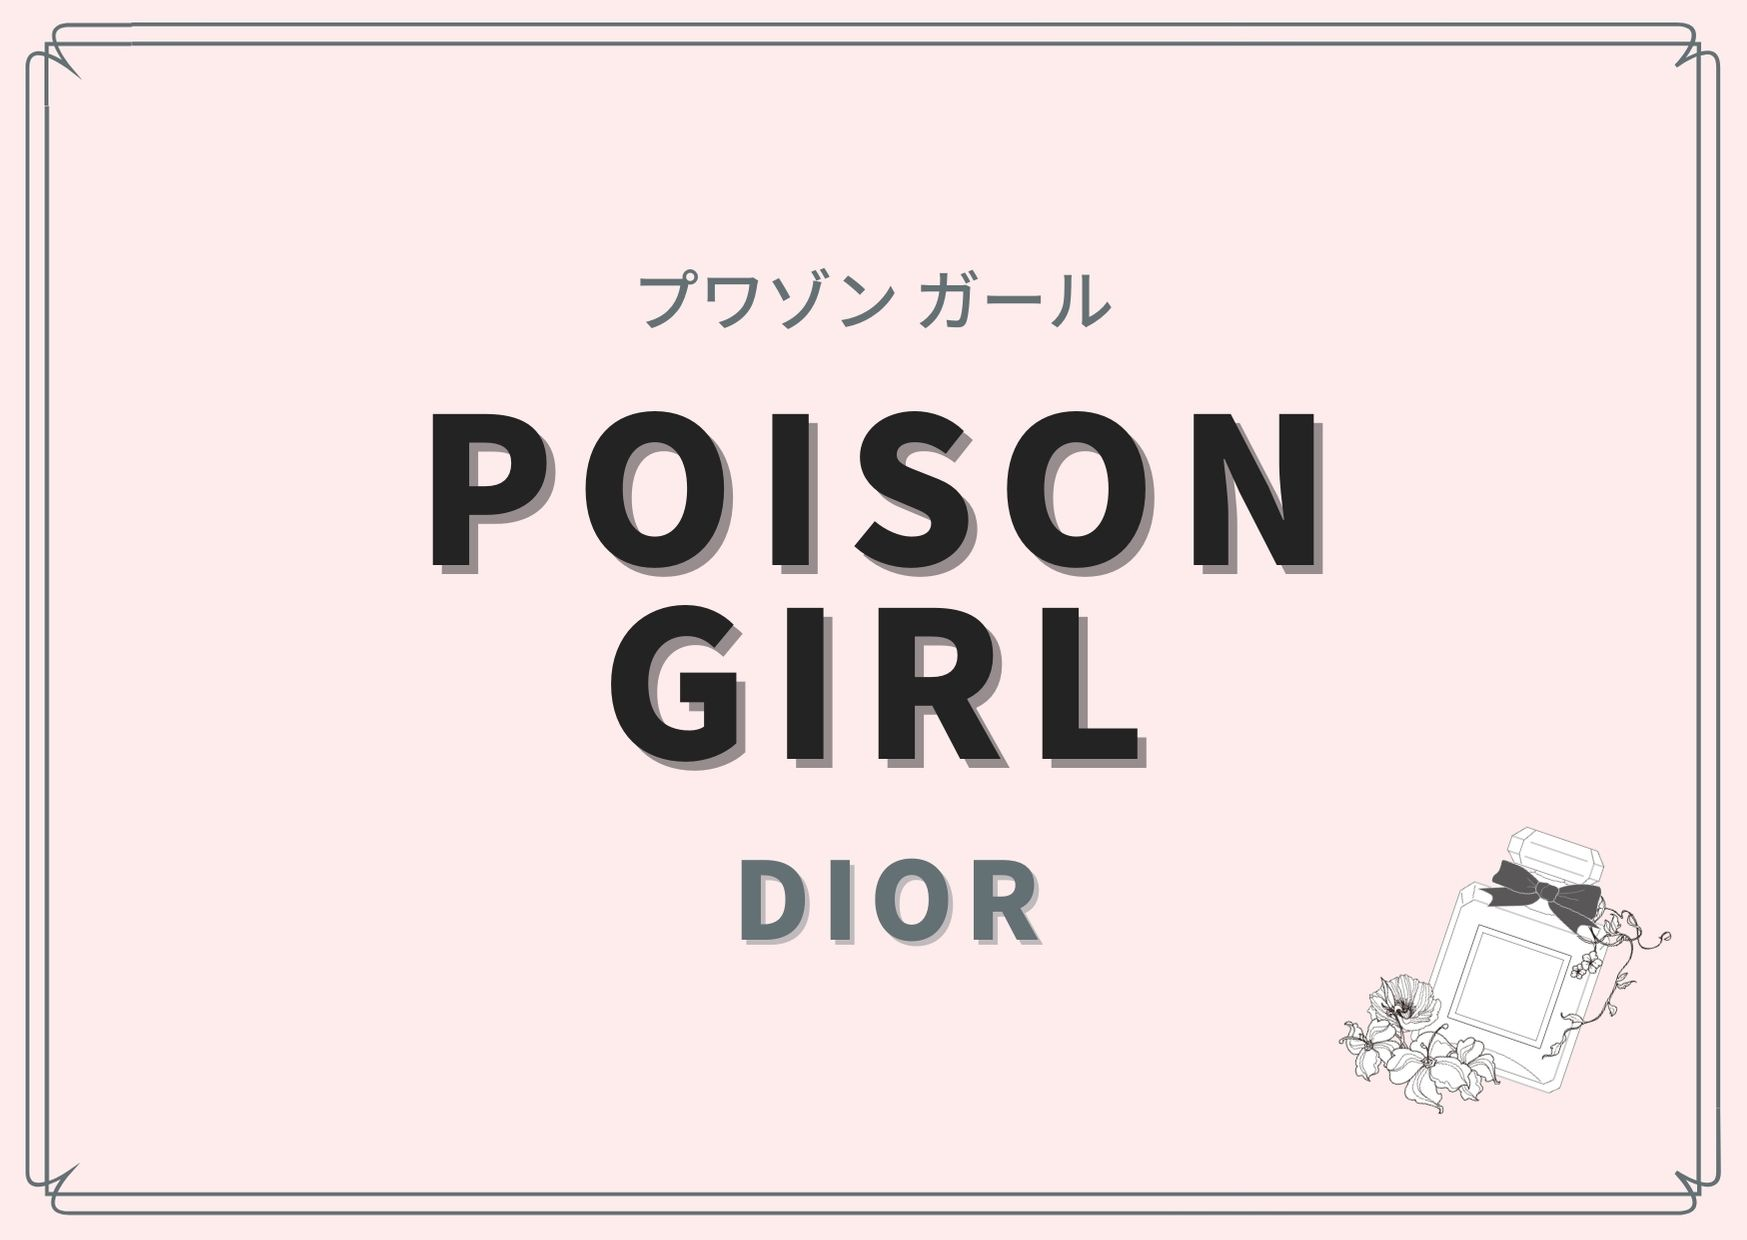 POISON GIRL(プワゾン ガール)/DIOR(ディオール)